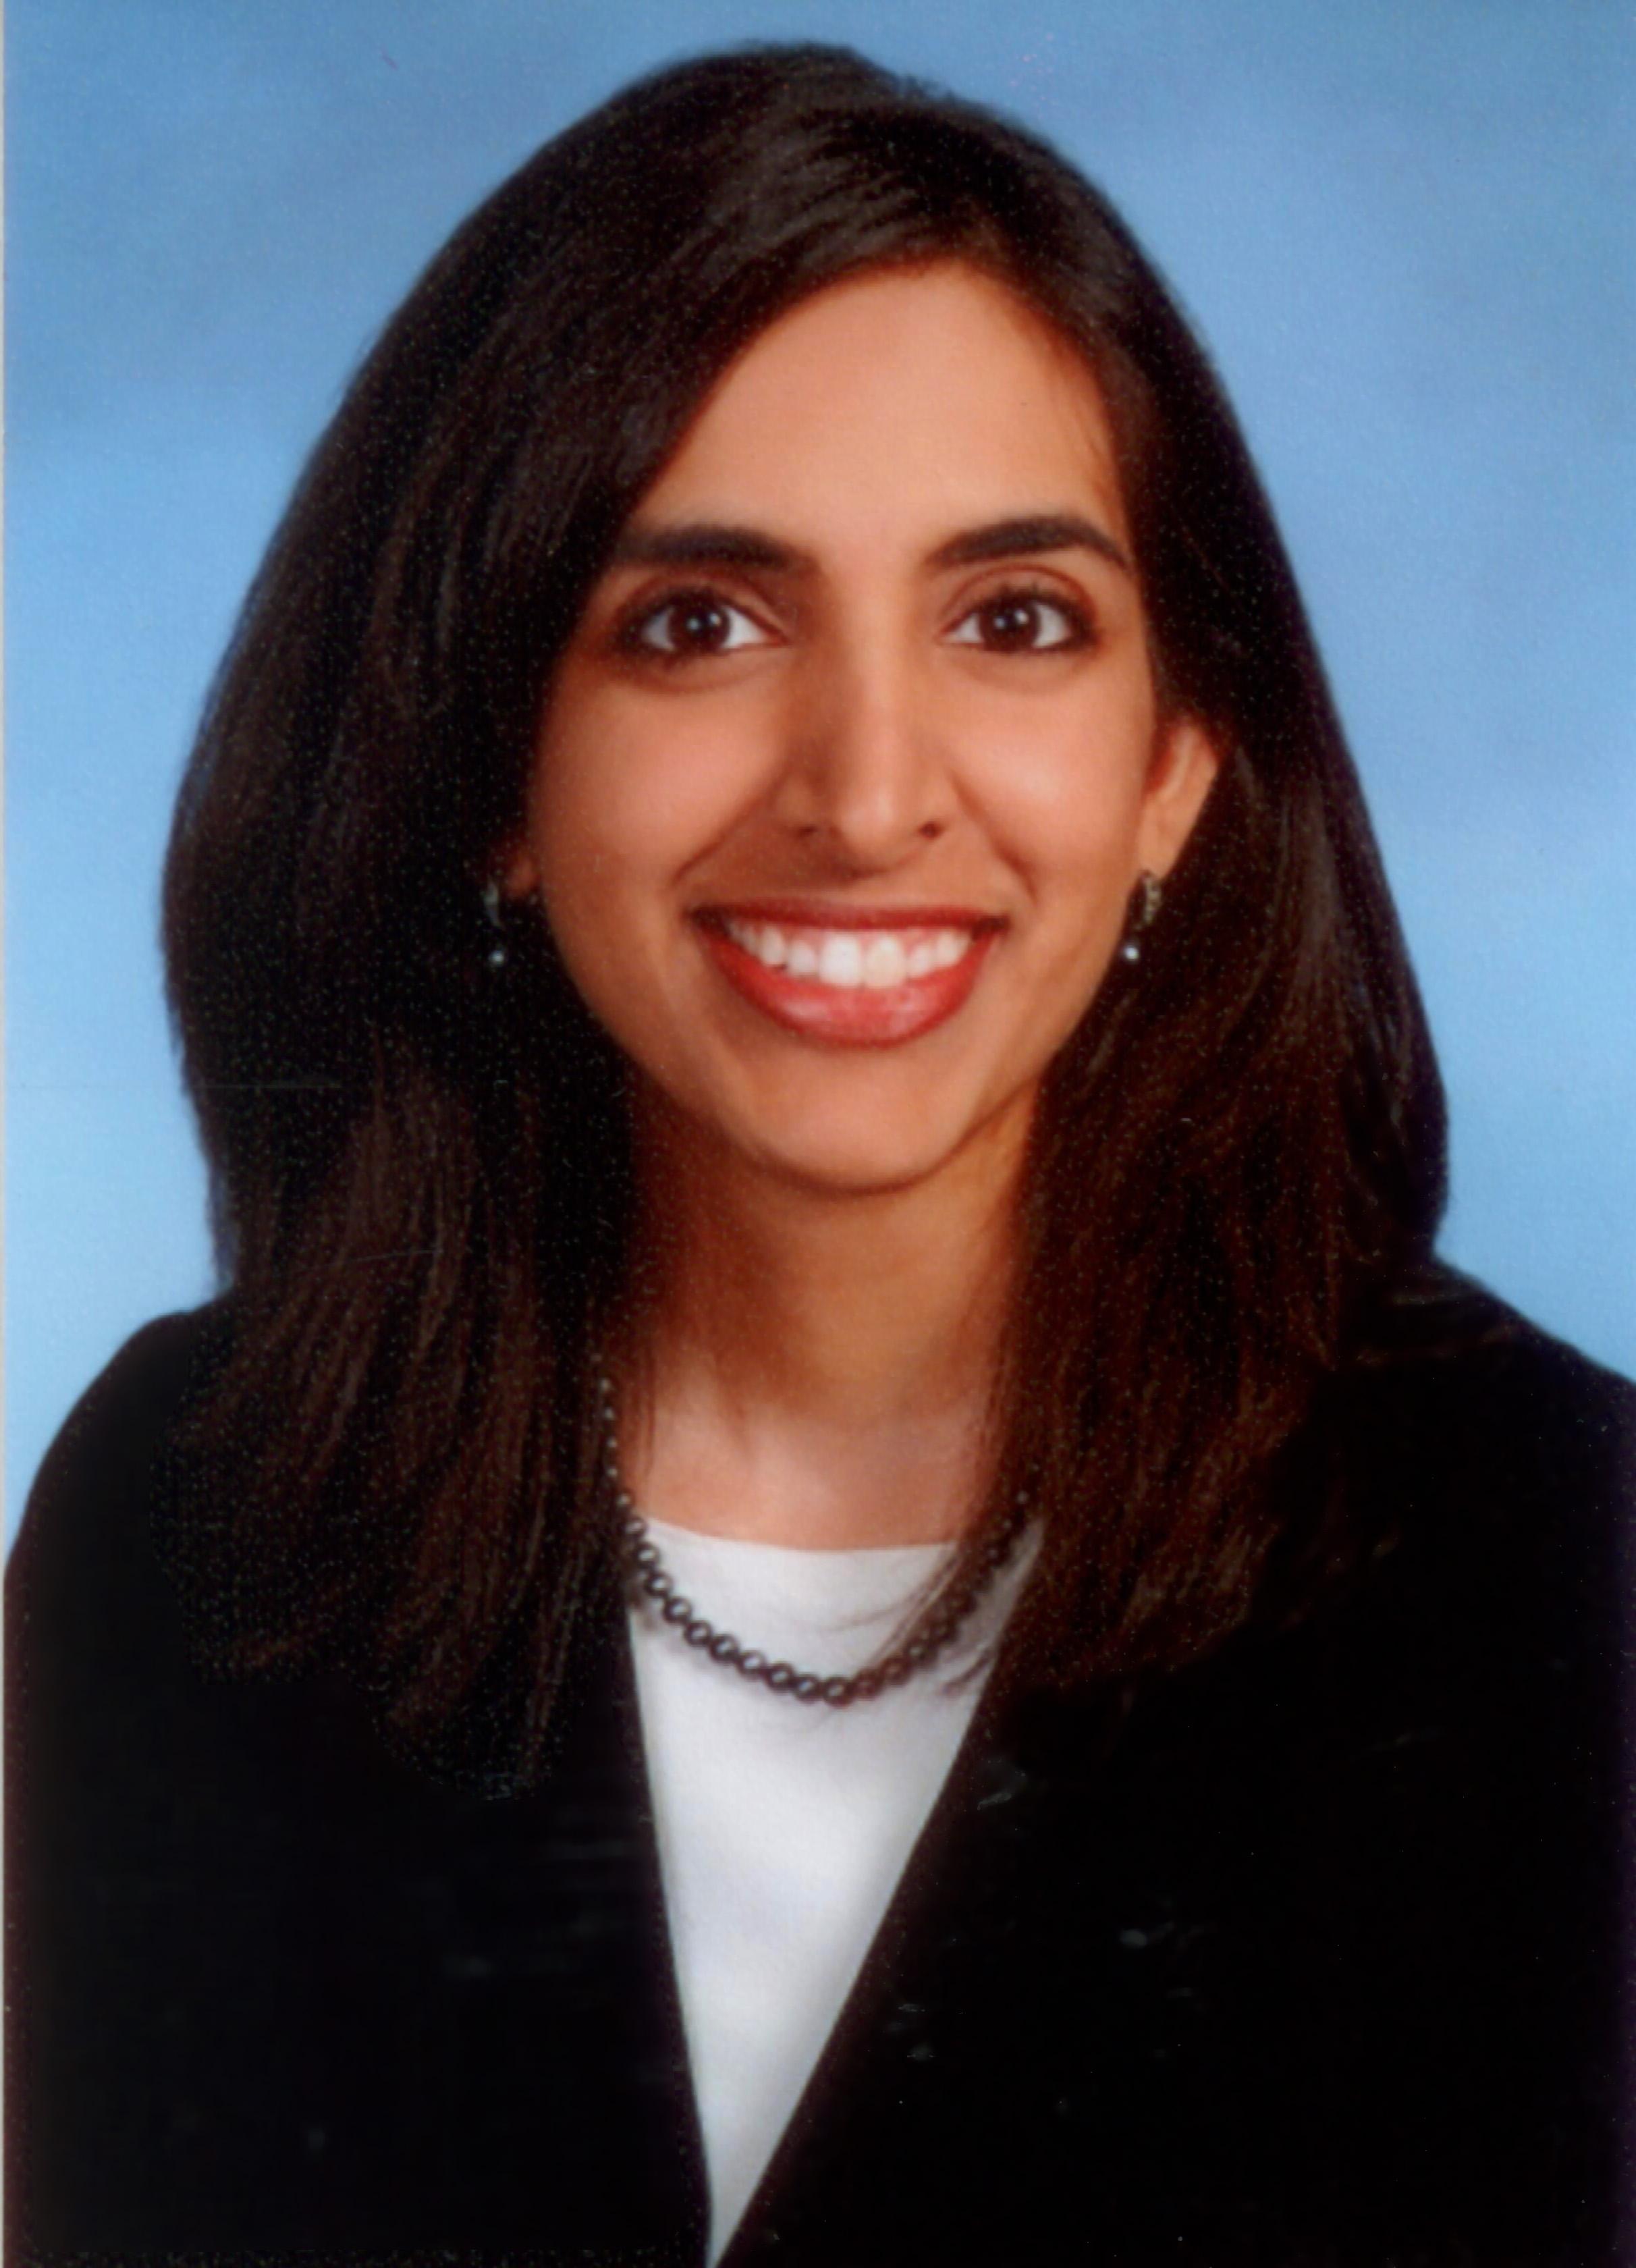 Anita P. Vin, MD